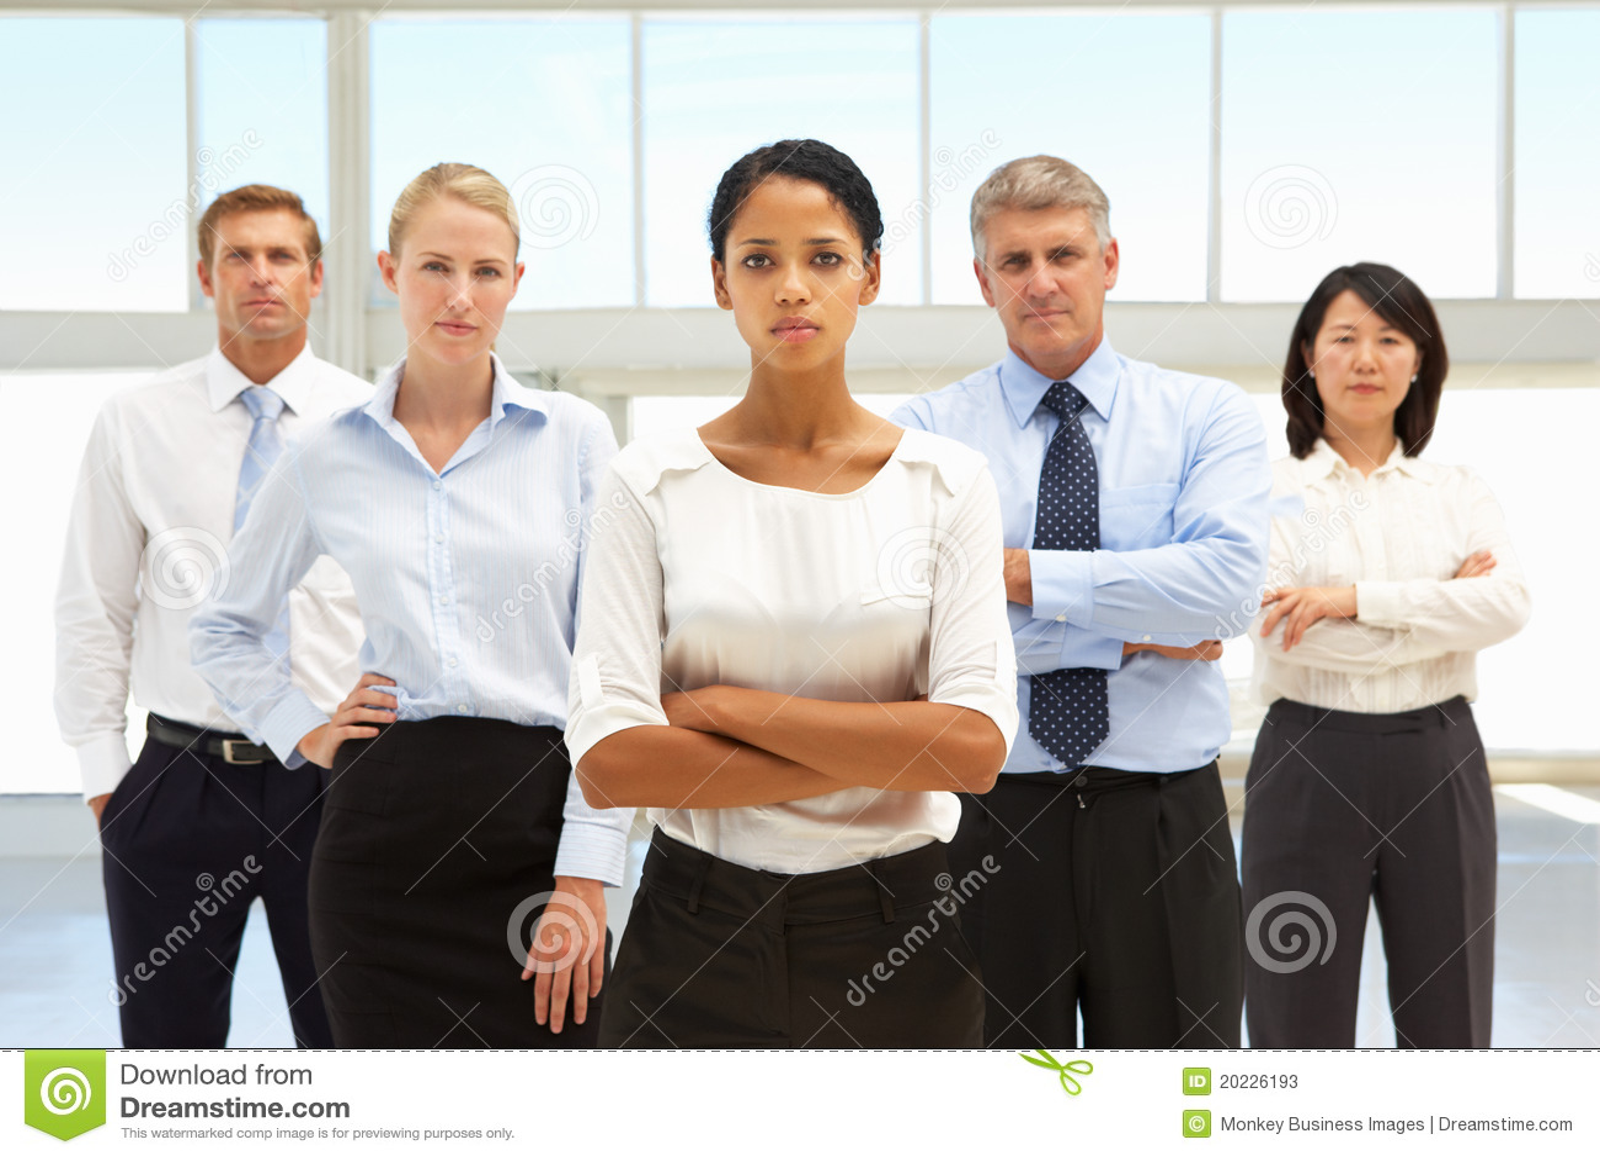 Serious Business People Stock Photos Image 20226193